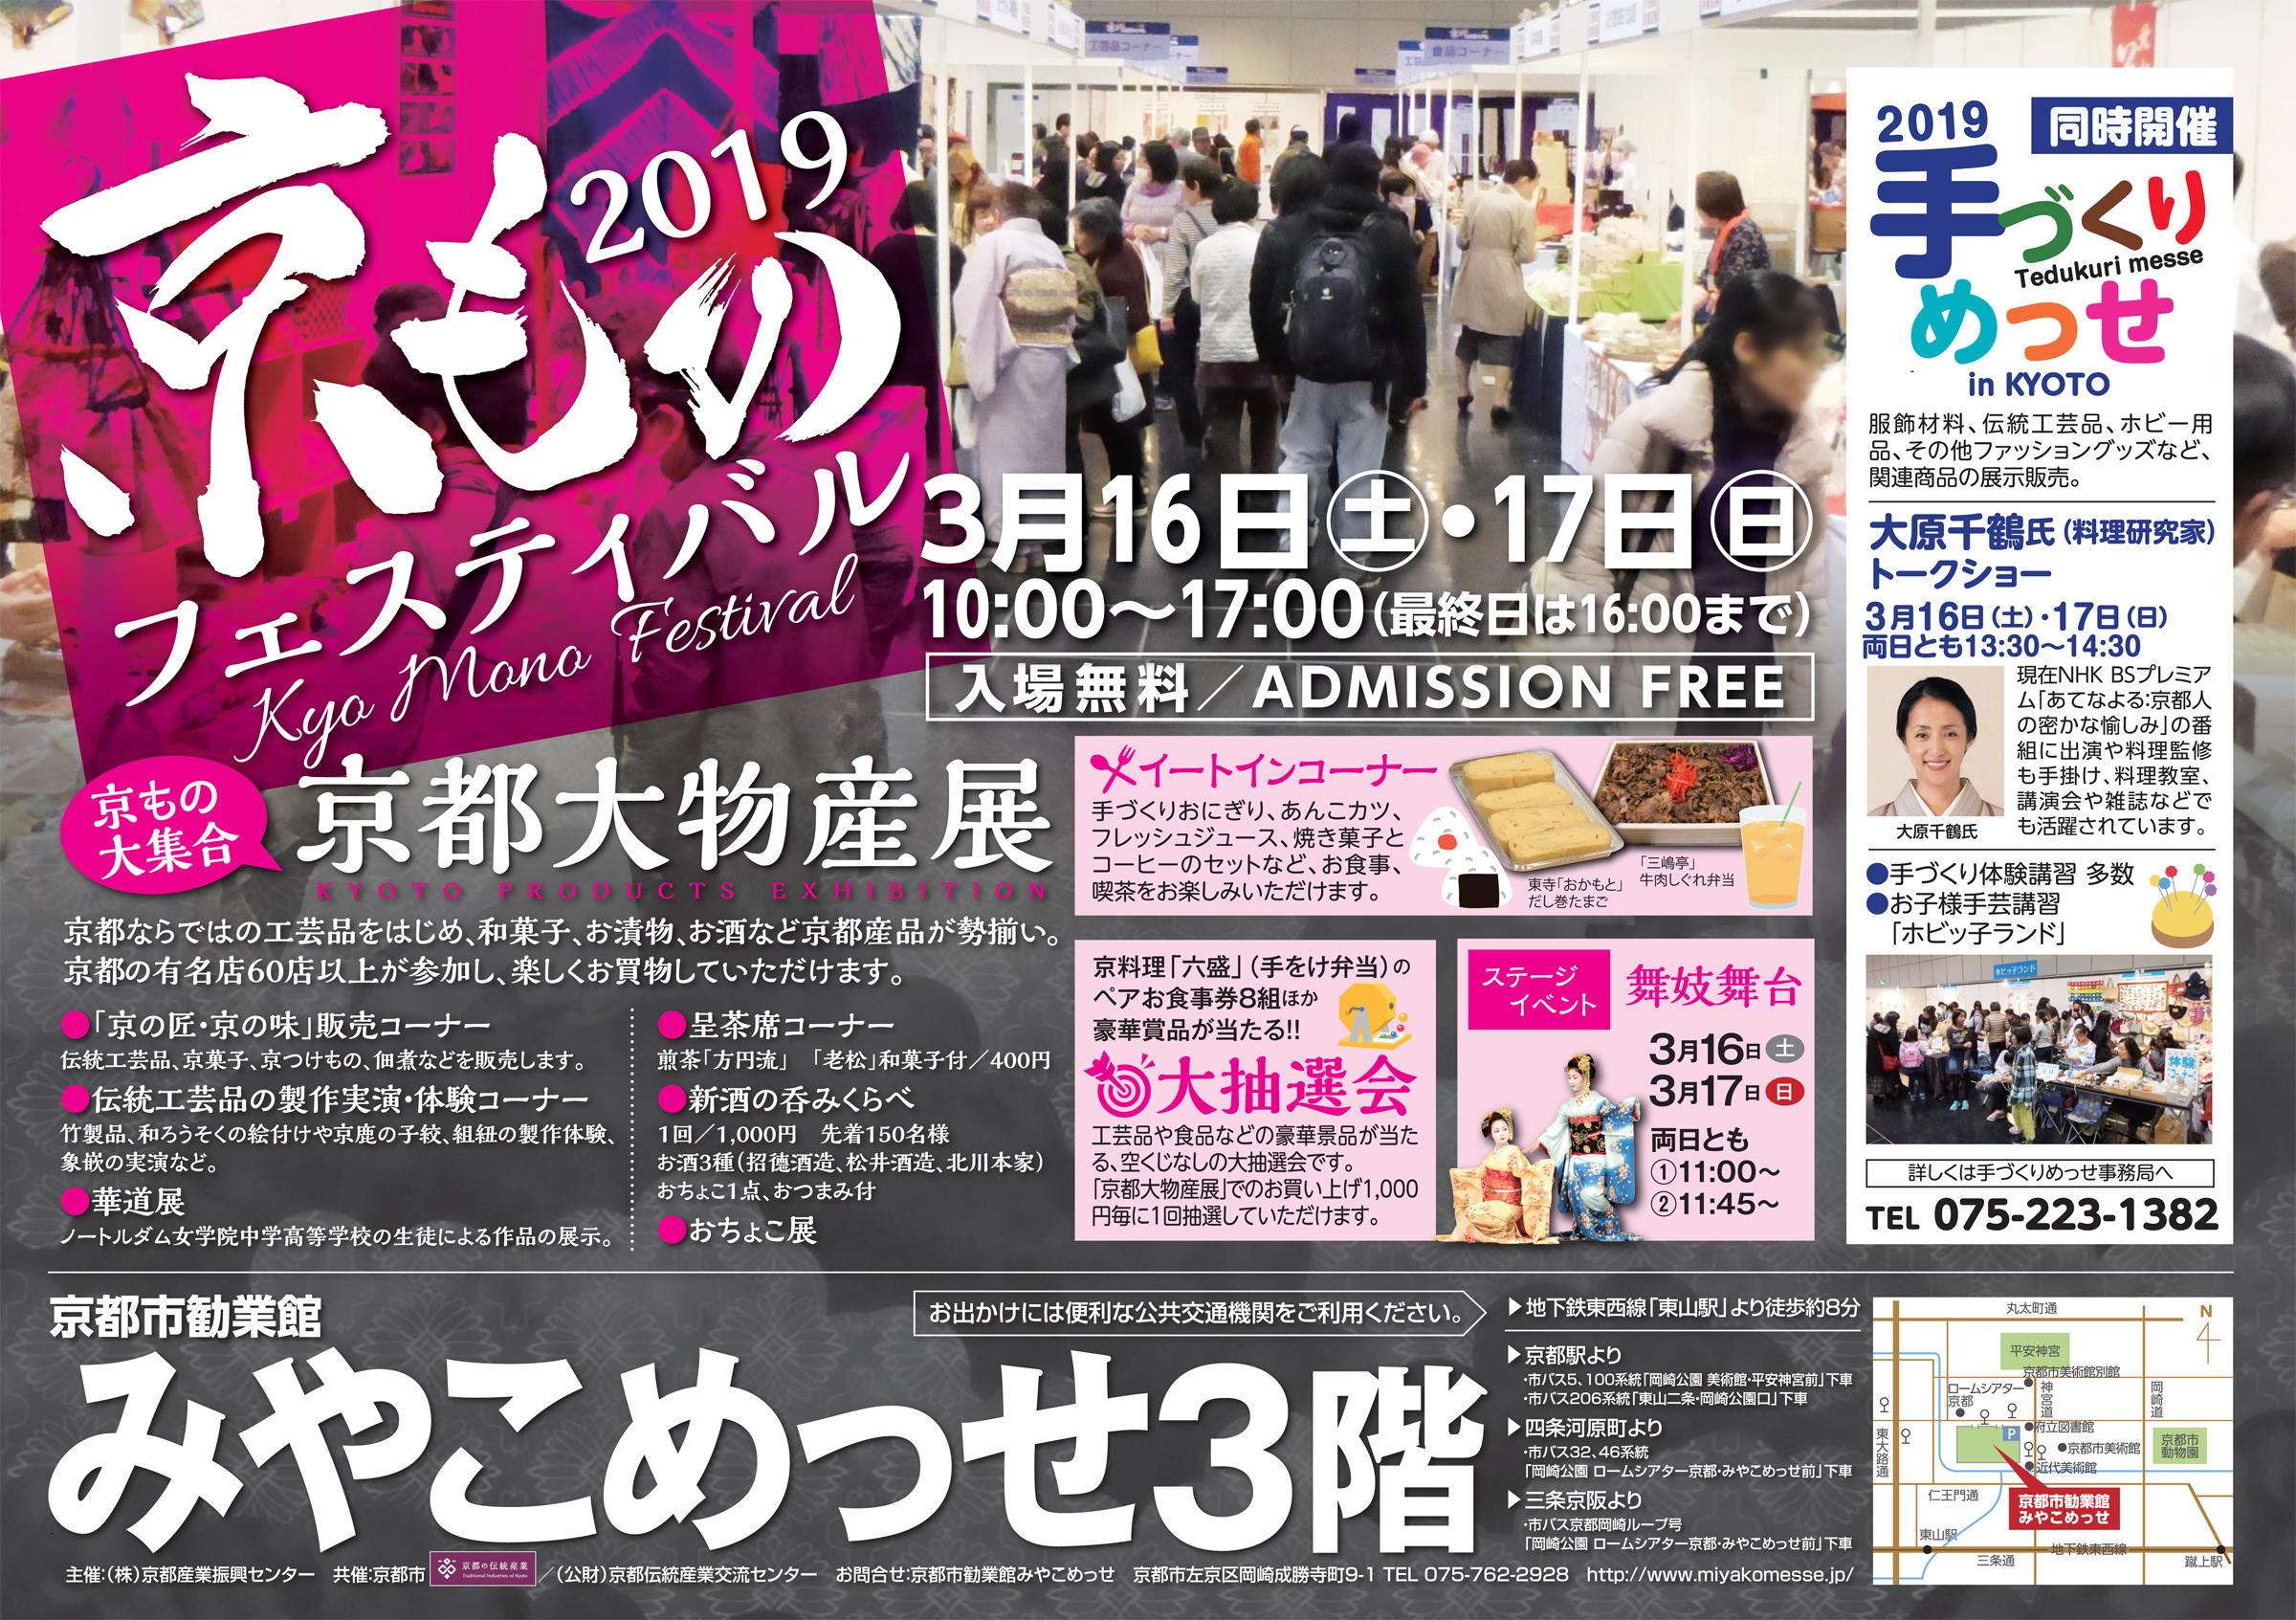 https://www.miyakomesse.jp/news/img/e1b2216b1cba4654f4107cc0dfa1ed616e286655.jpg